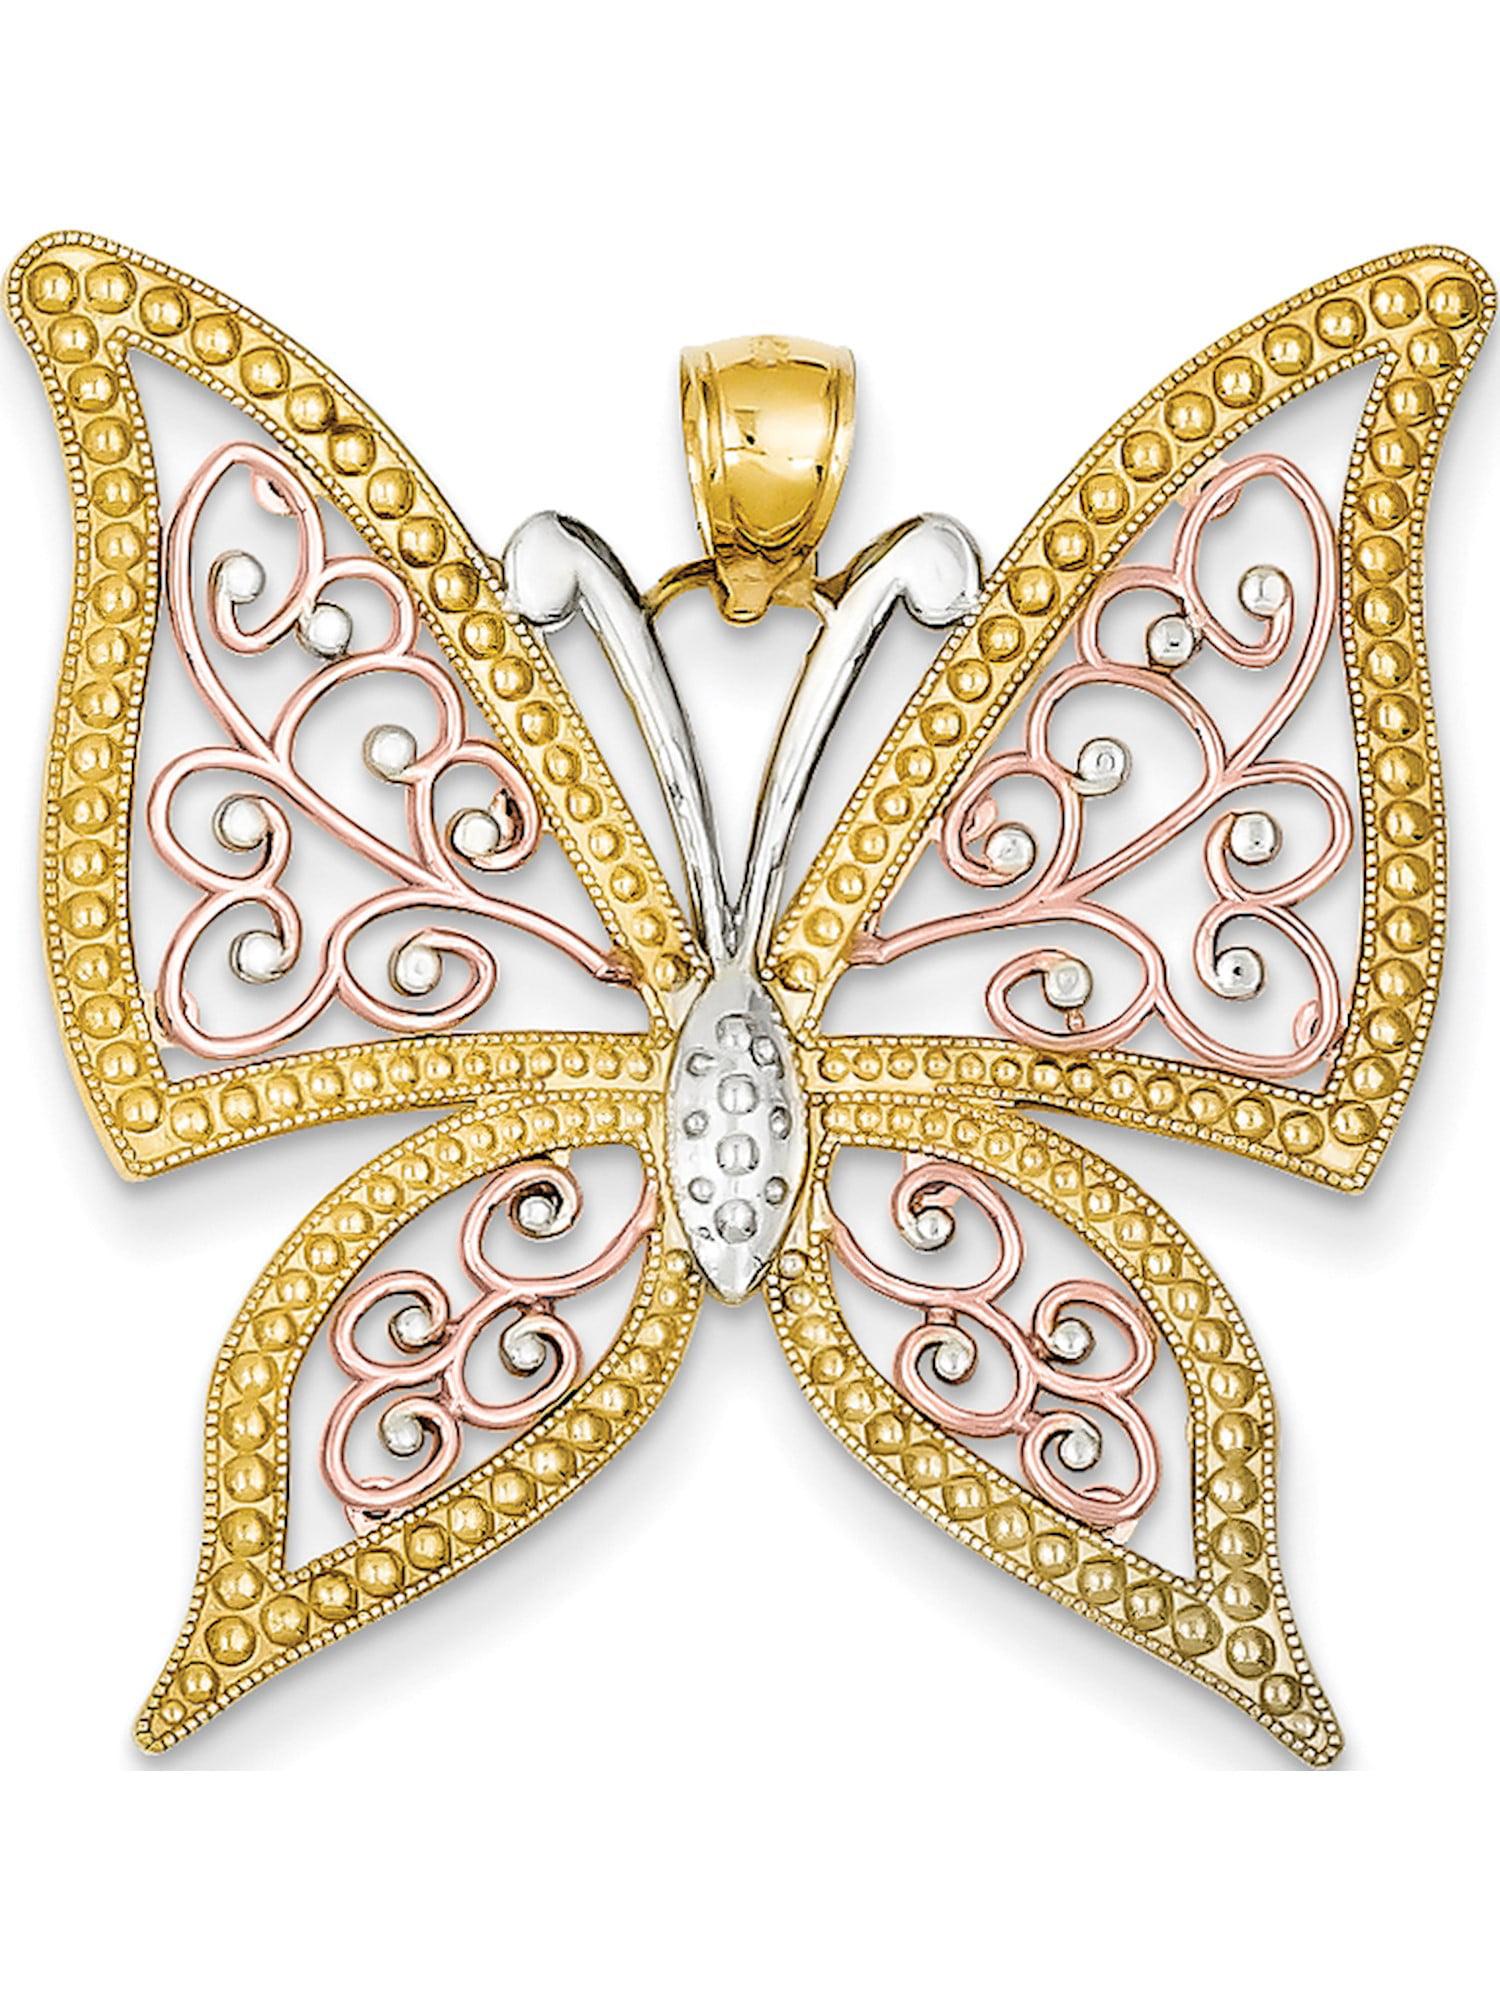 14k Yellow Gold Textured Filigree Style Butterlfy Pendant